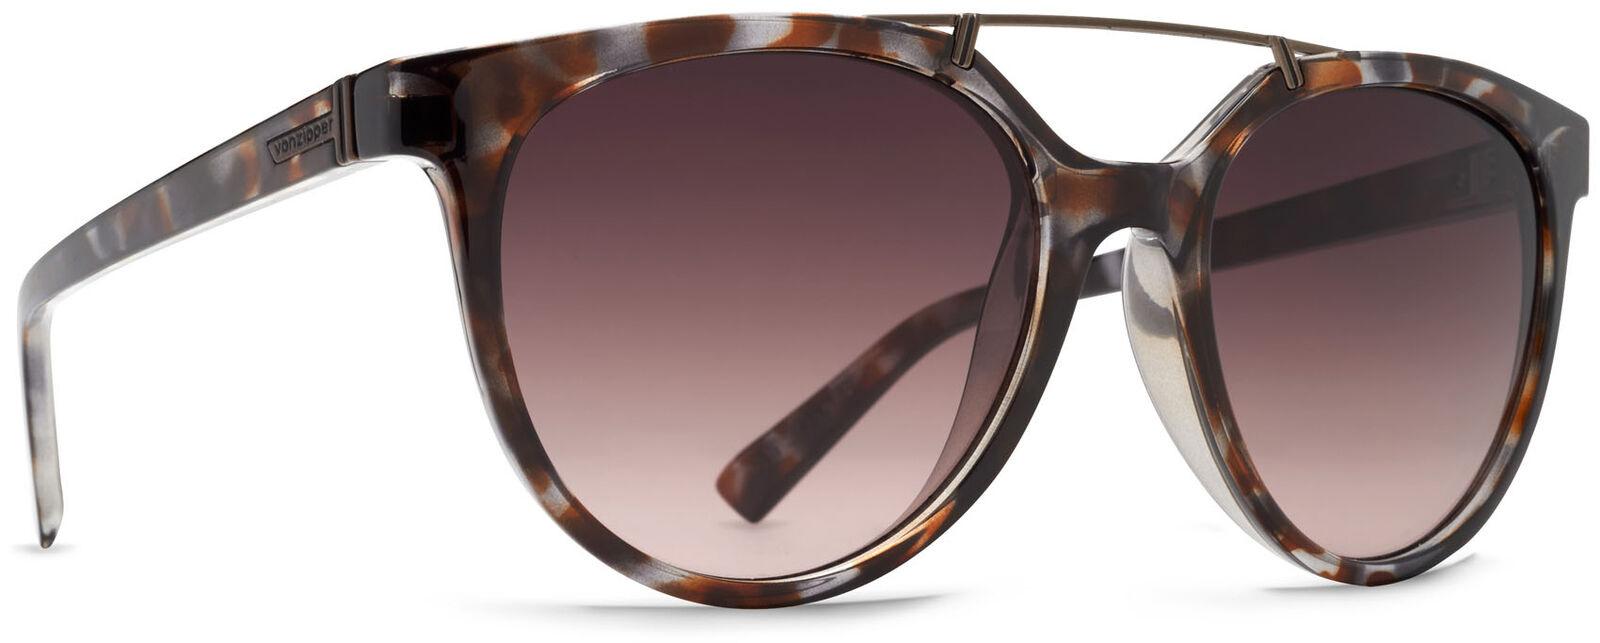 Von Zipper Hitsville Brown Gradient Lens Sunglasses, Tortoise Gloss